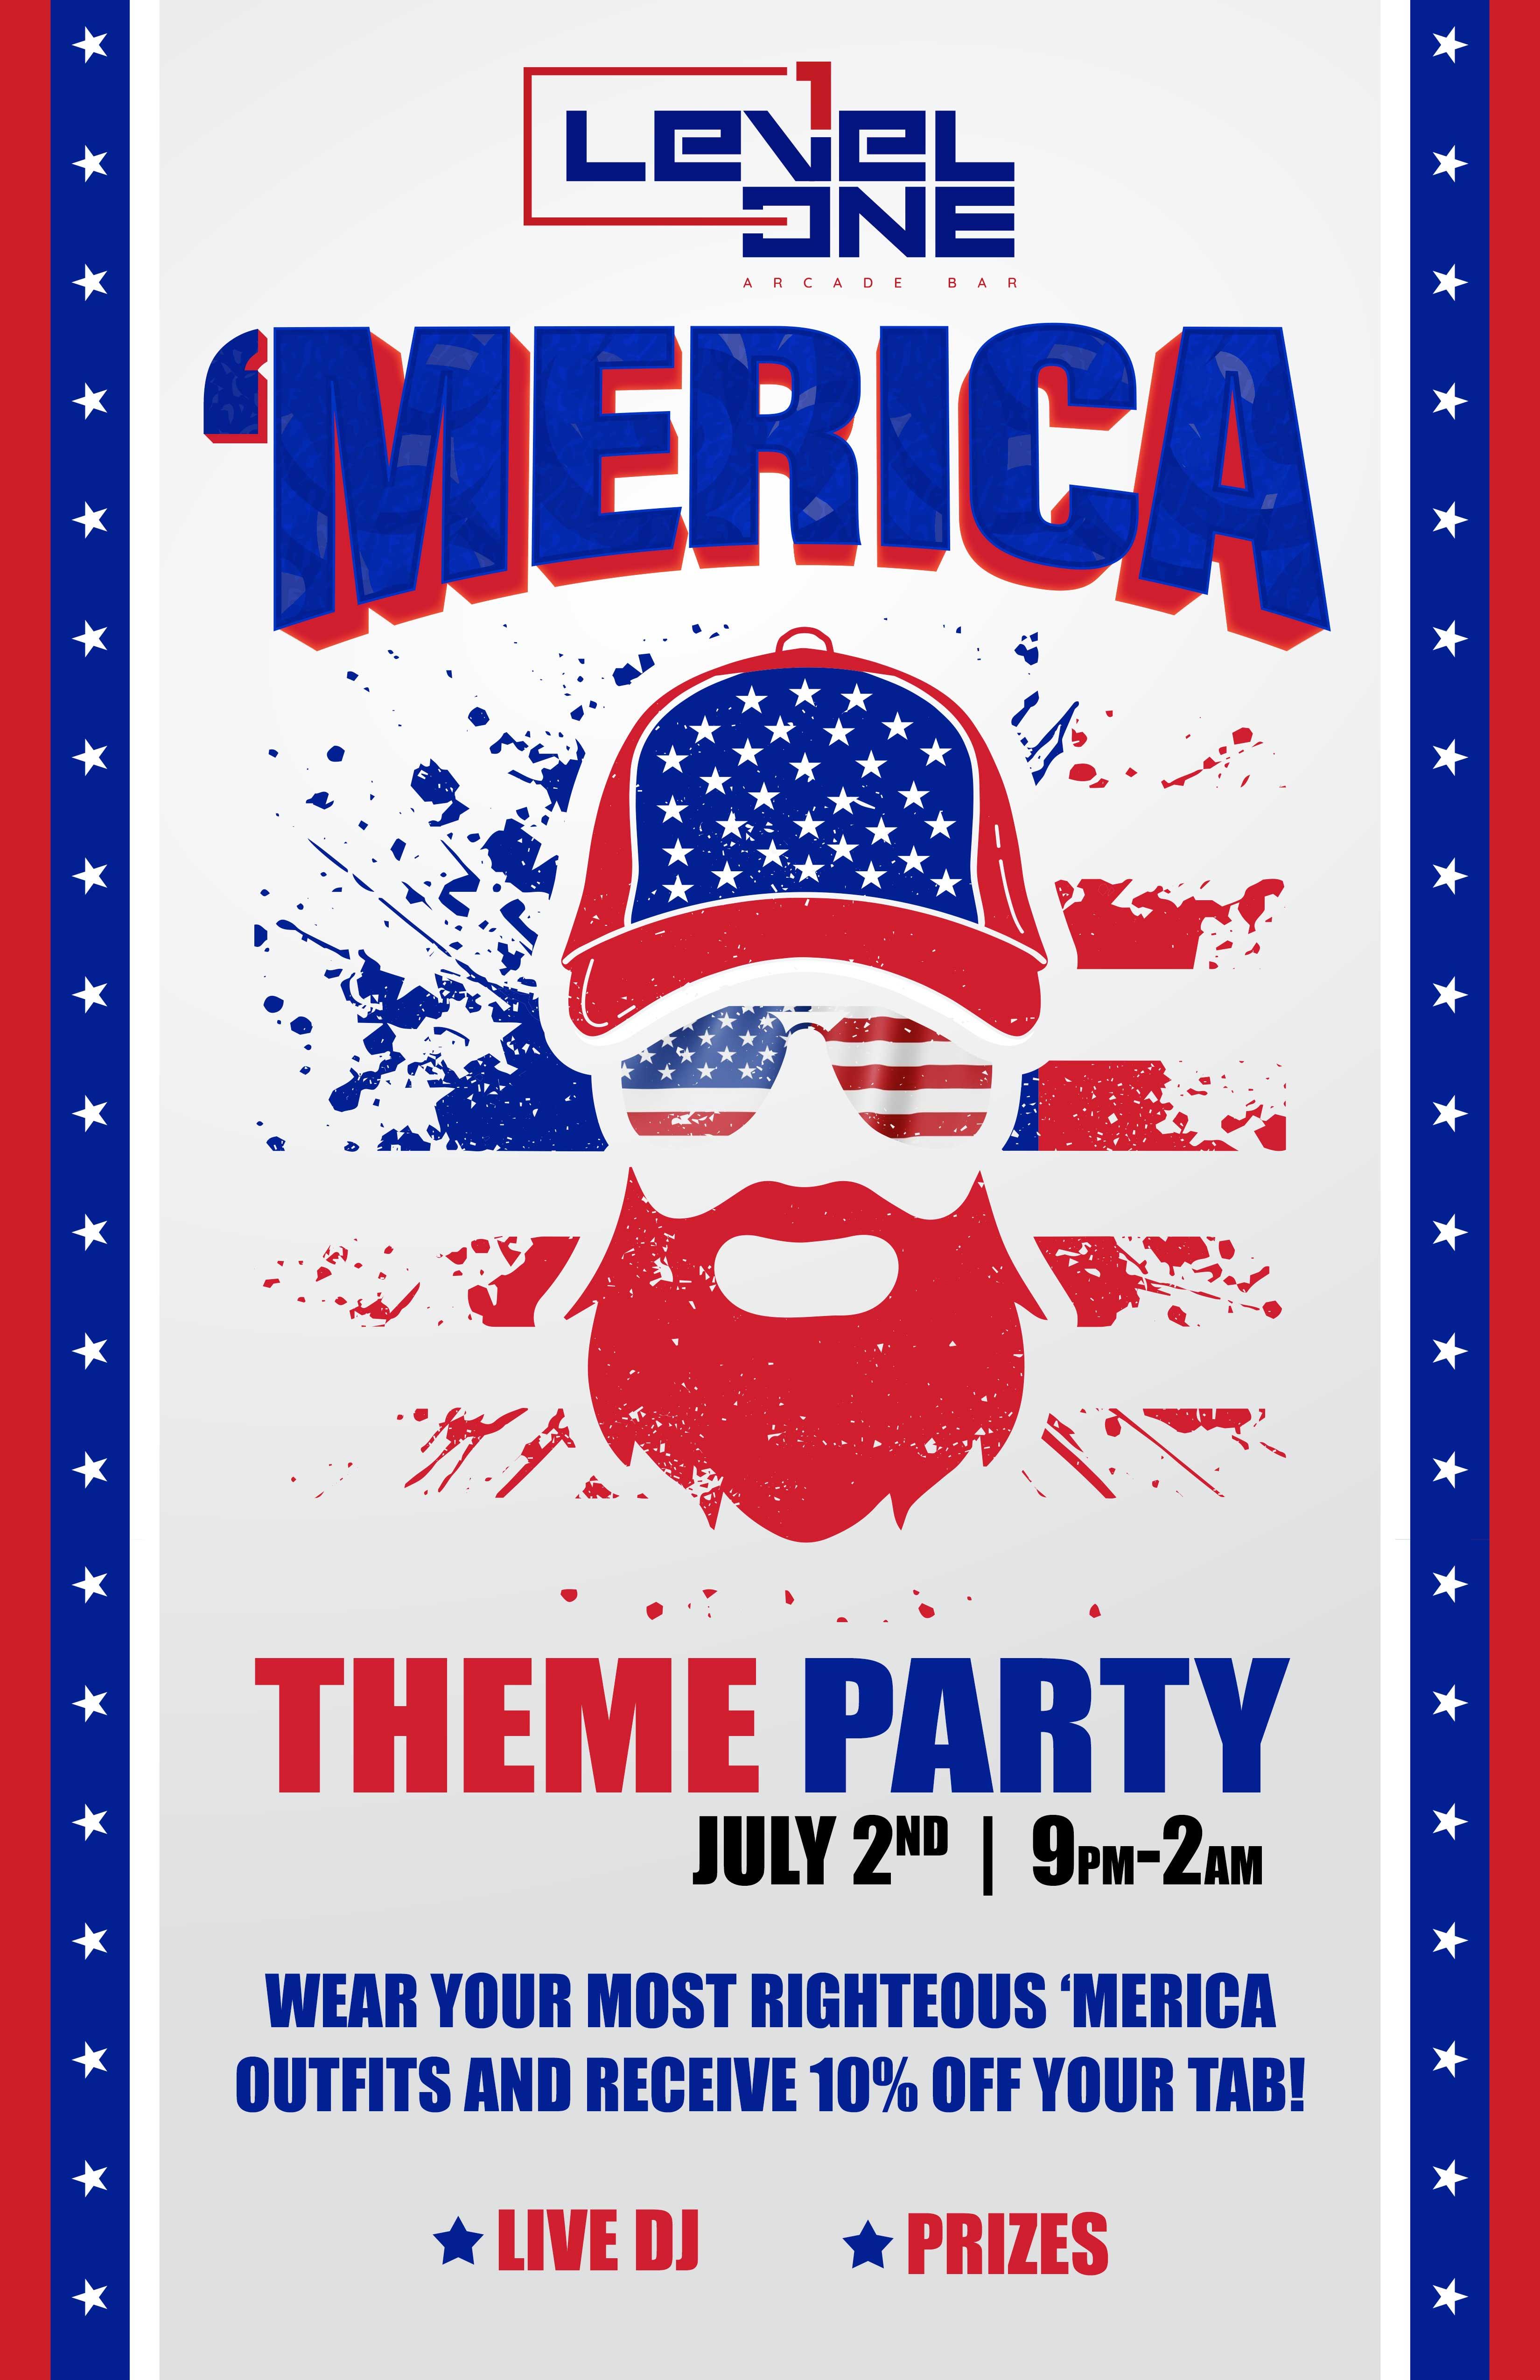 'Merica Theme Party